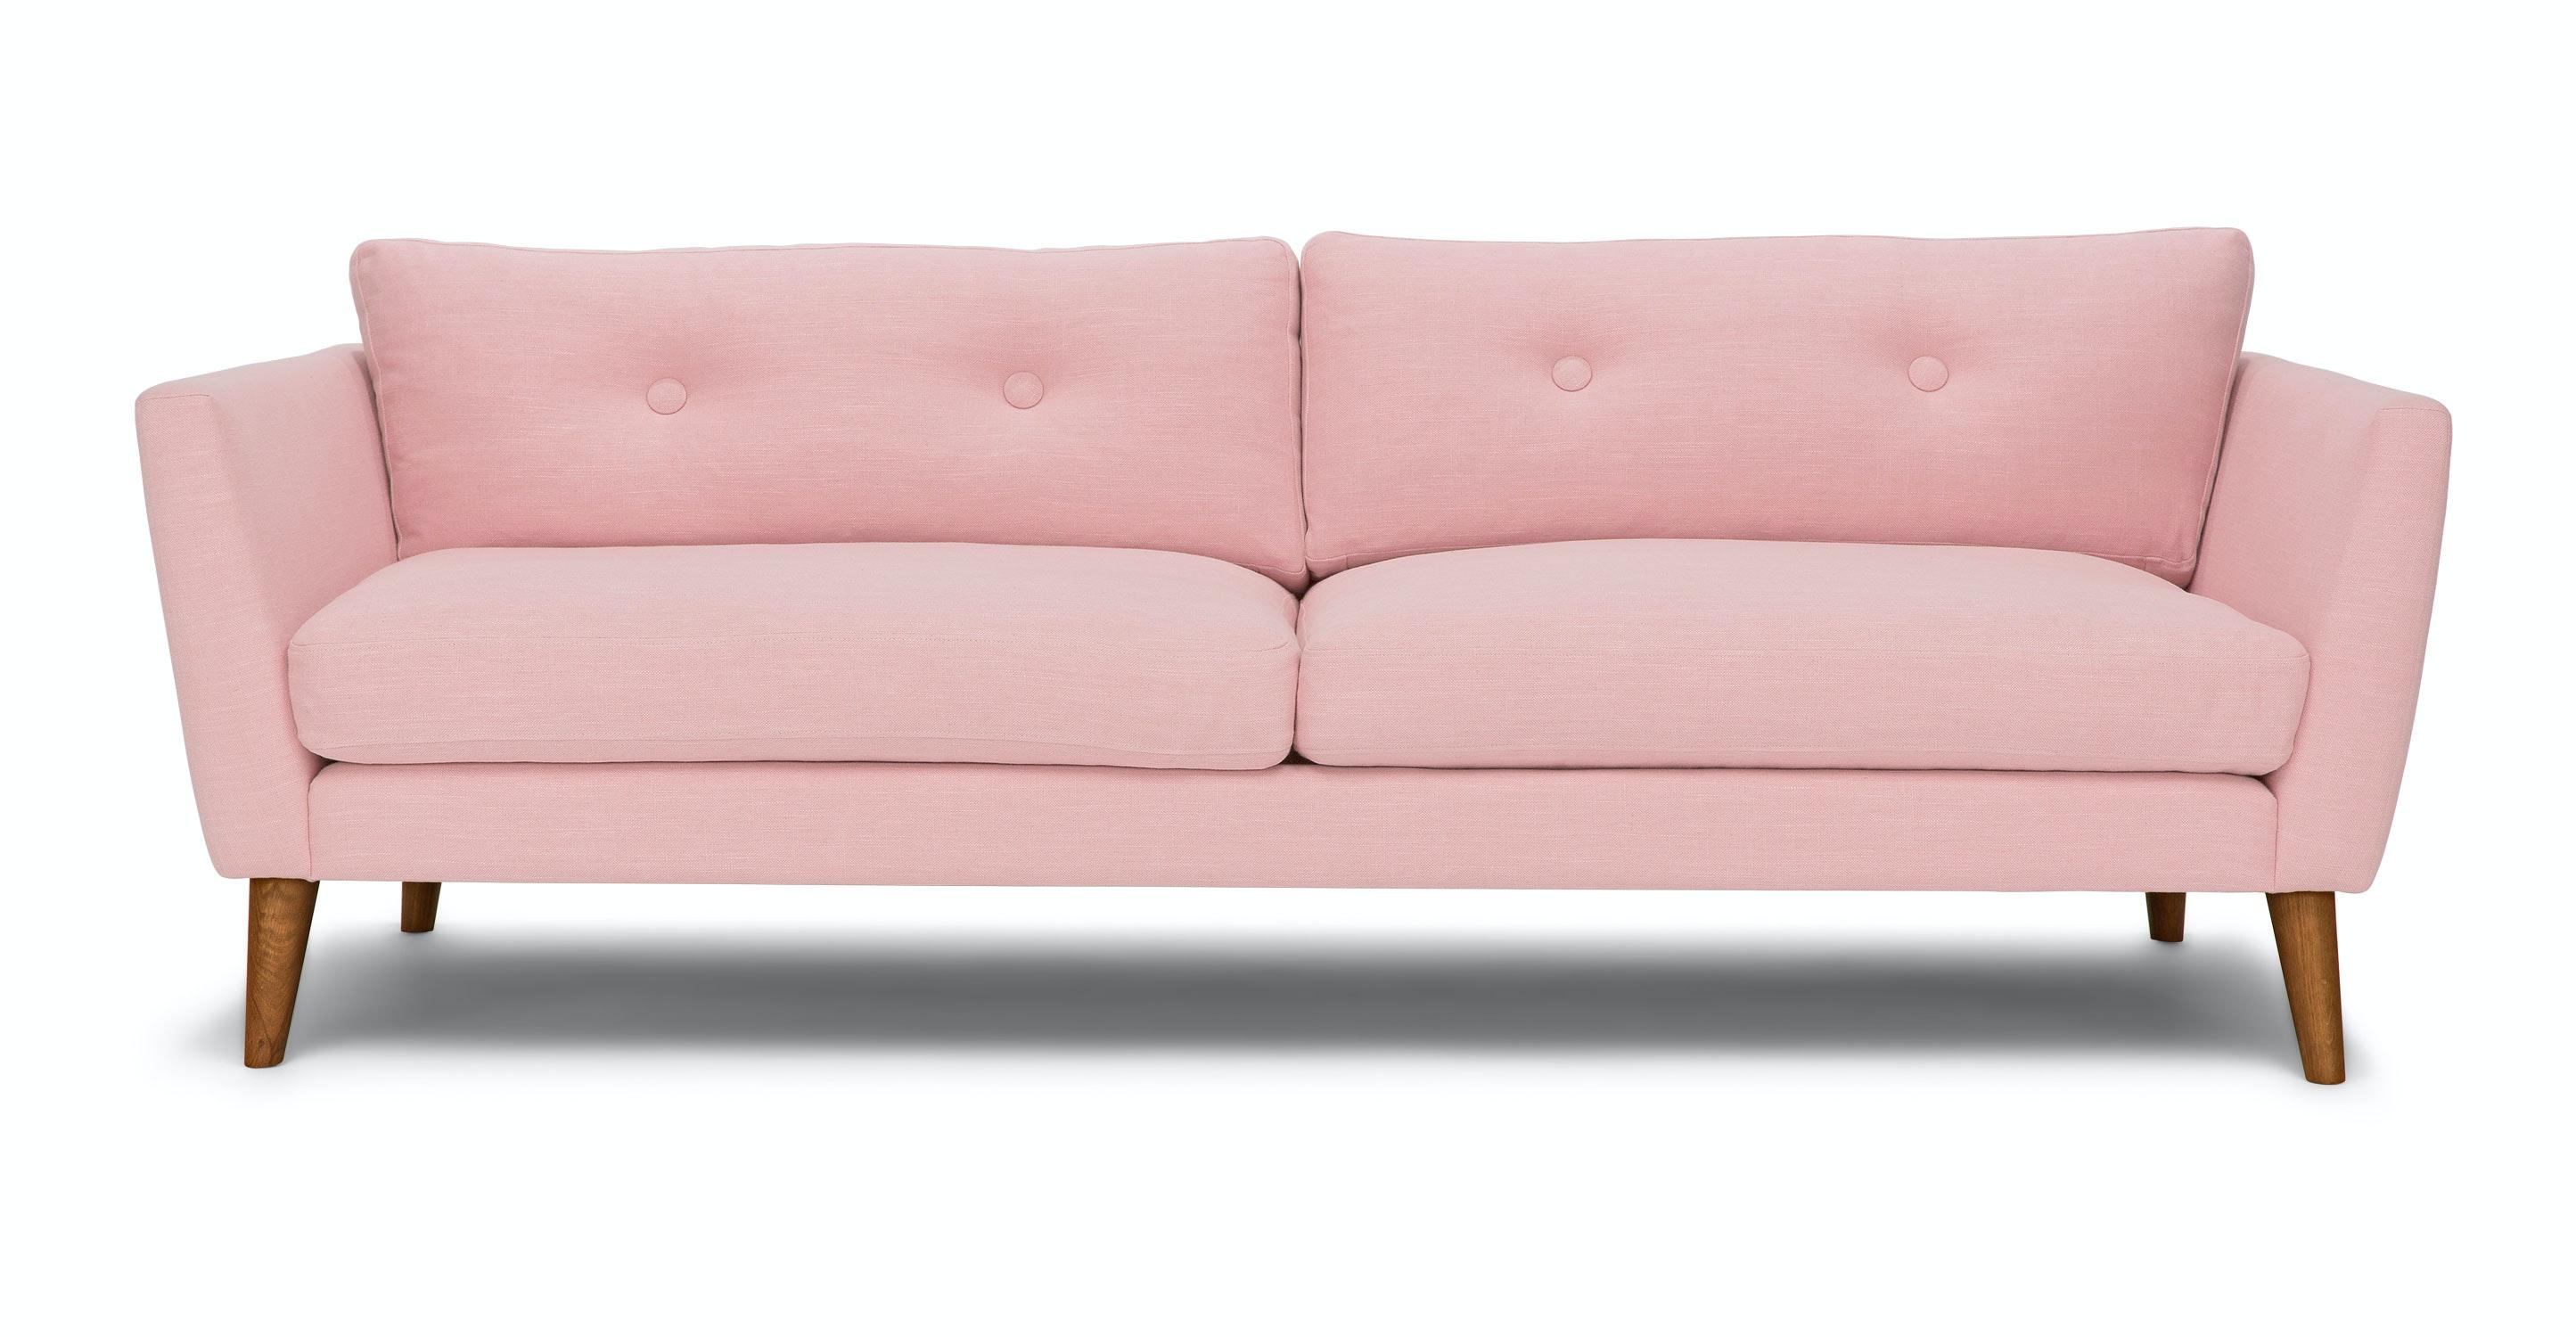 Merveilleux Emil Quartz Rose Sofa   Sofas   Article | Modern, Mid Century And  Scandinavian Furniture